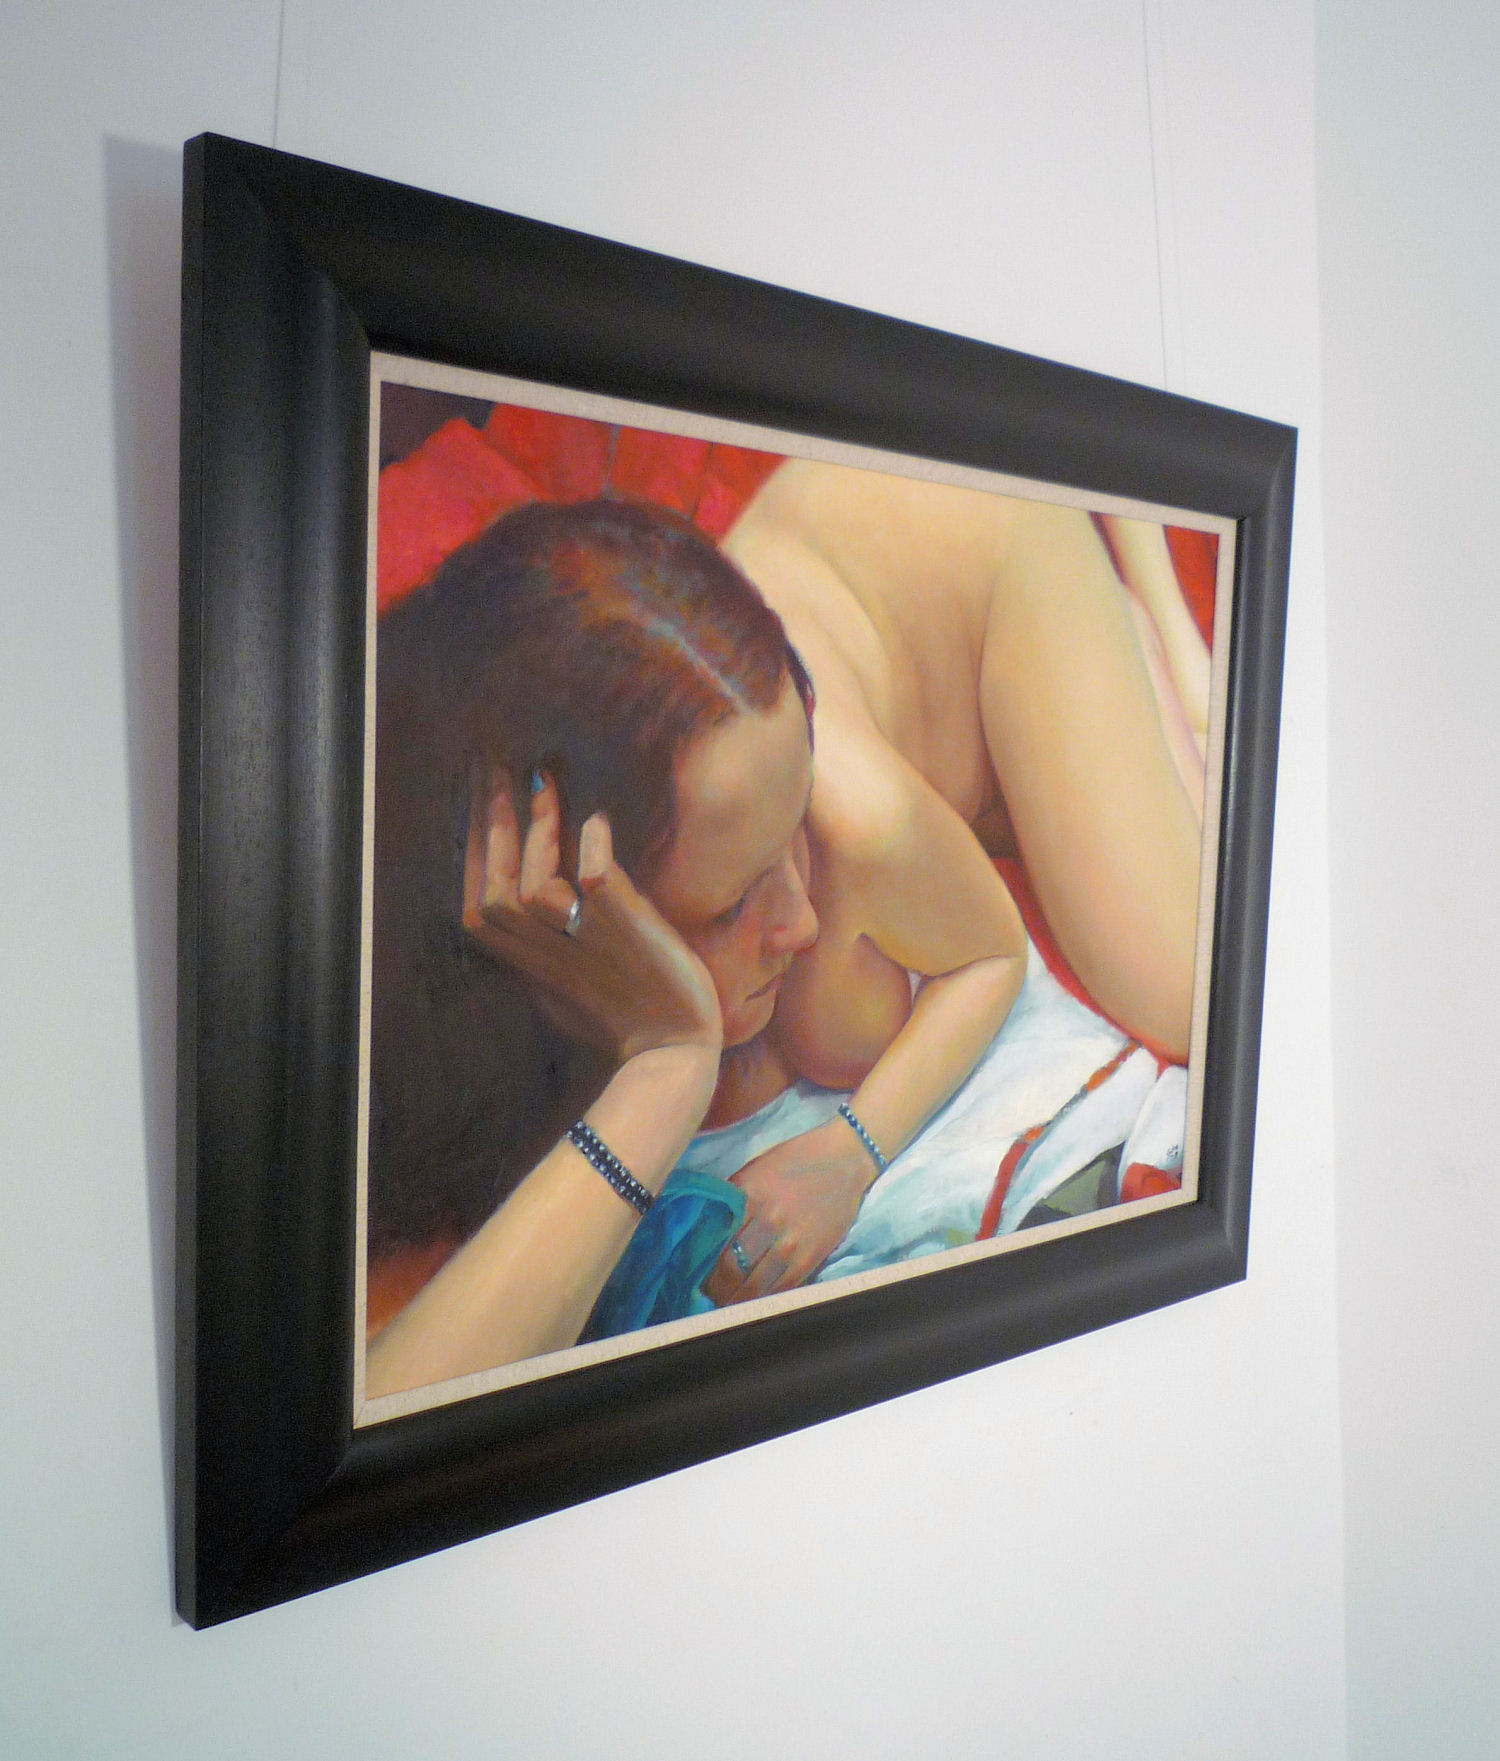 'Reclining Figure 2' by artist Stuart Sim